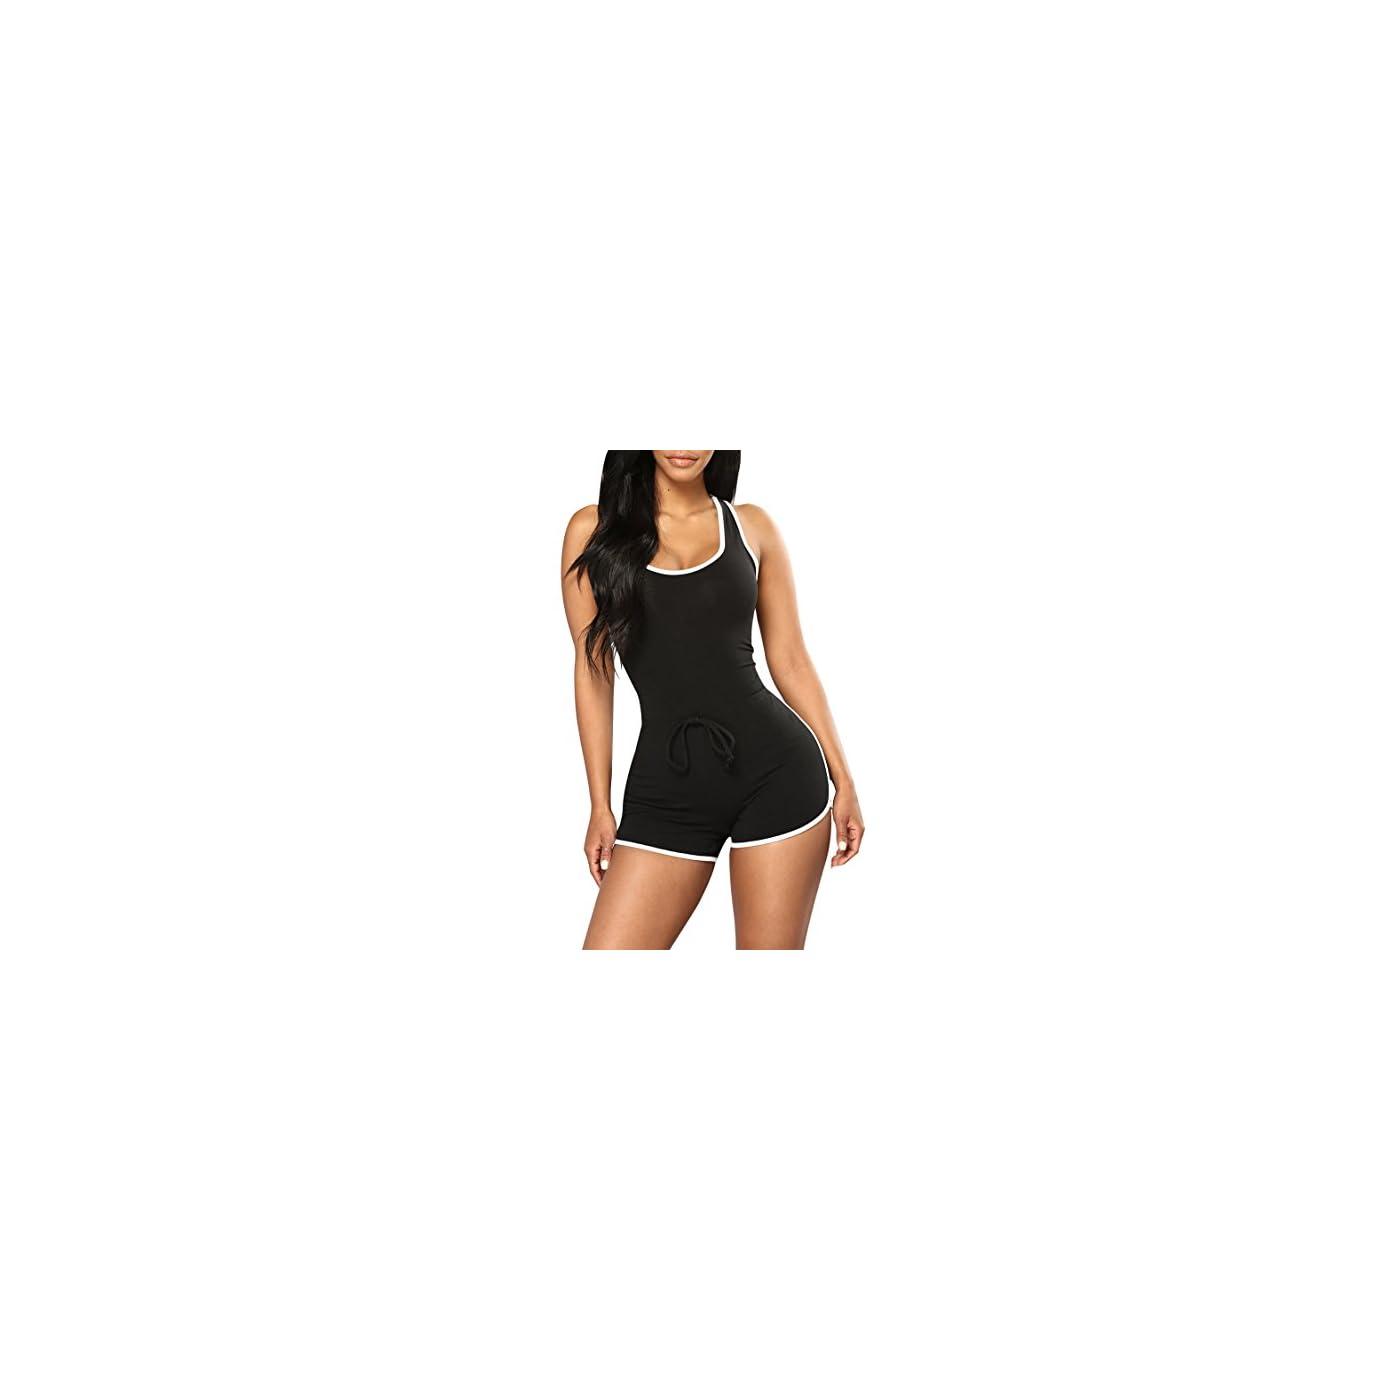 Selowin Womens Active Sport Sleeveless Racerback Tank Top Bodycon Shorts Romper Jumpsuit 41RLh2XBq8L